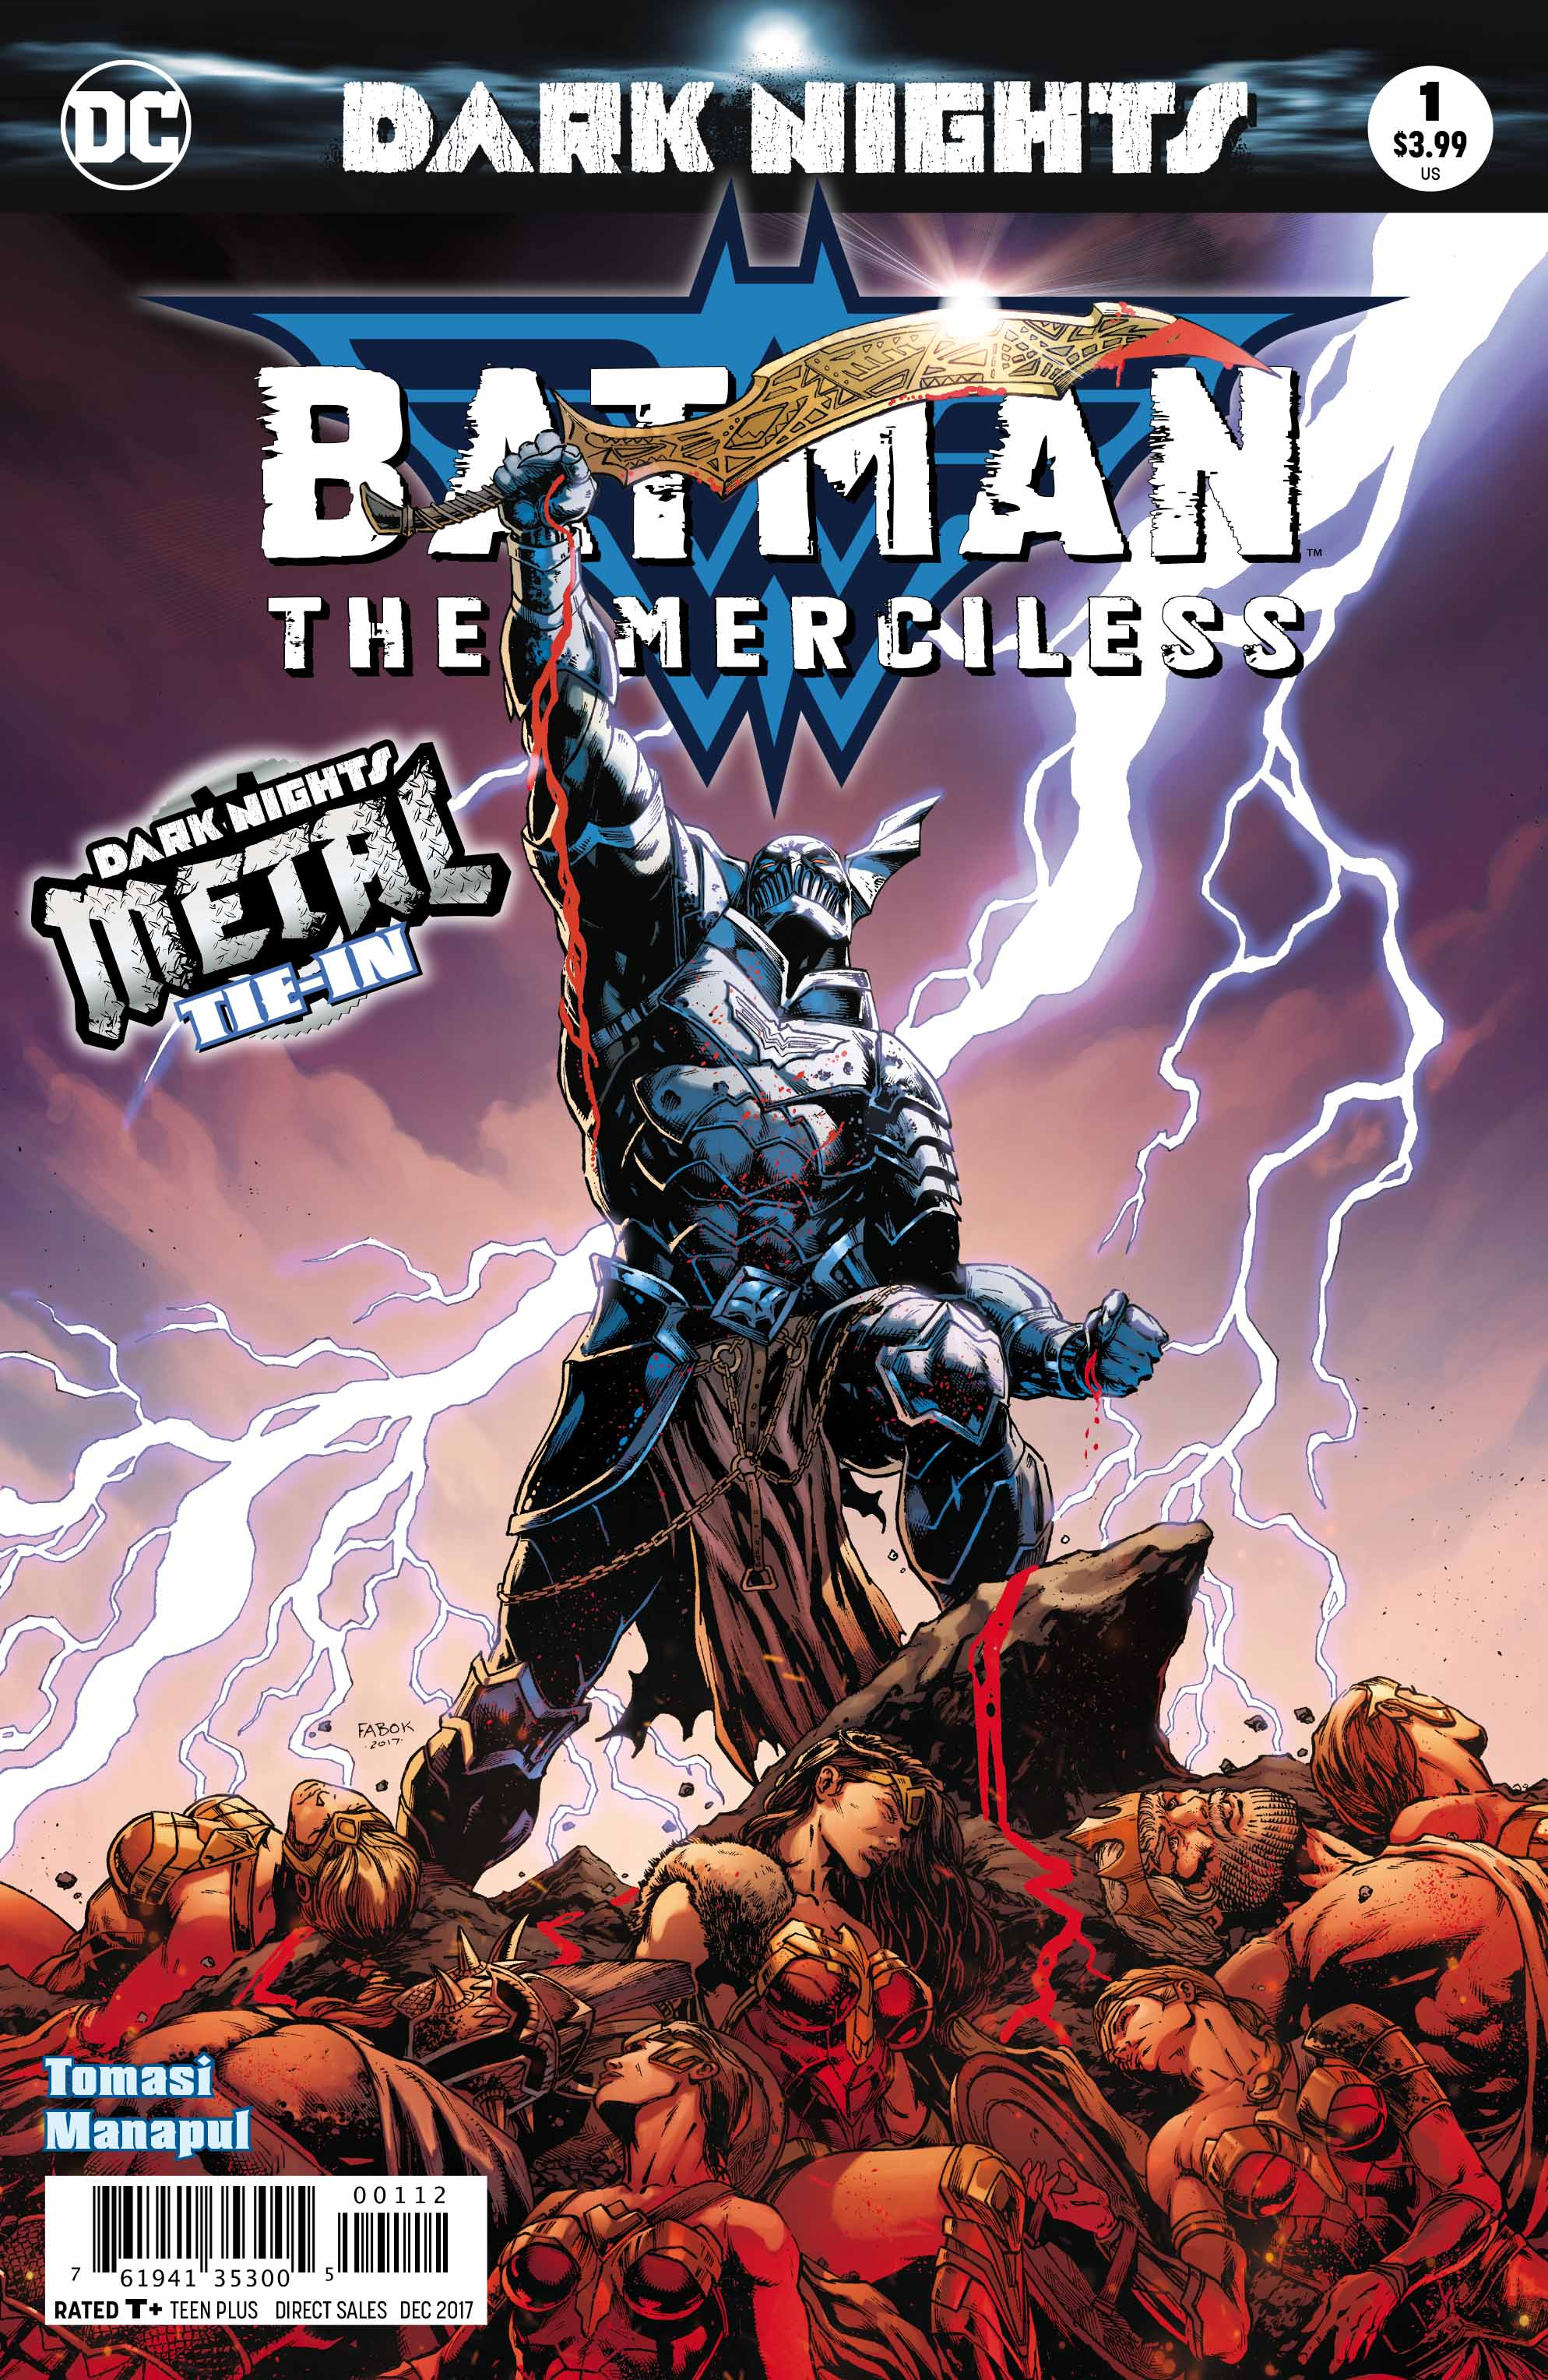 Batman: The Merciless #1 (METAL Tie- In)